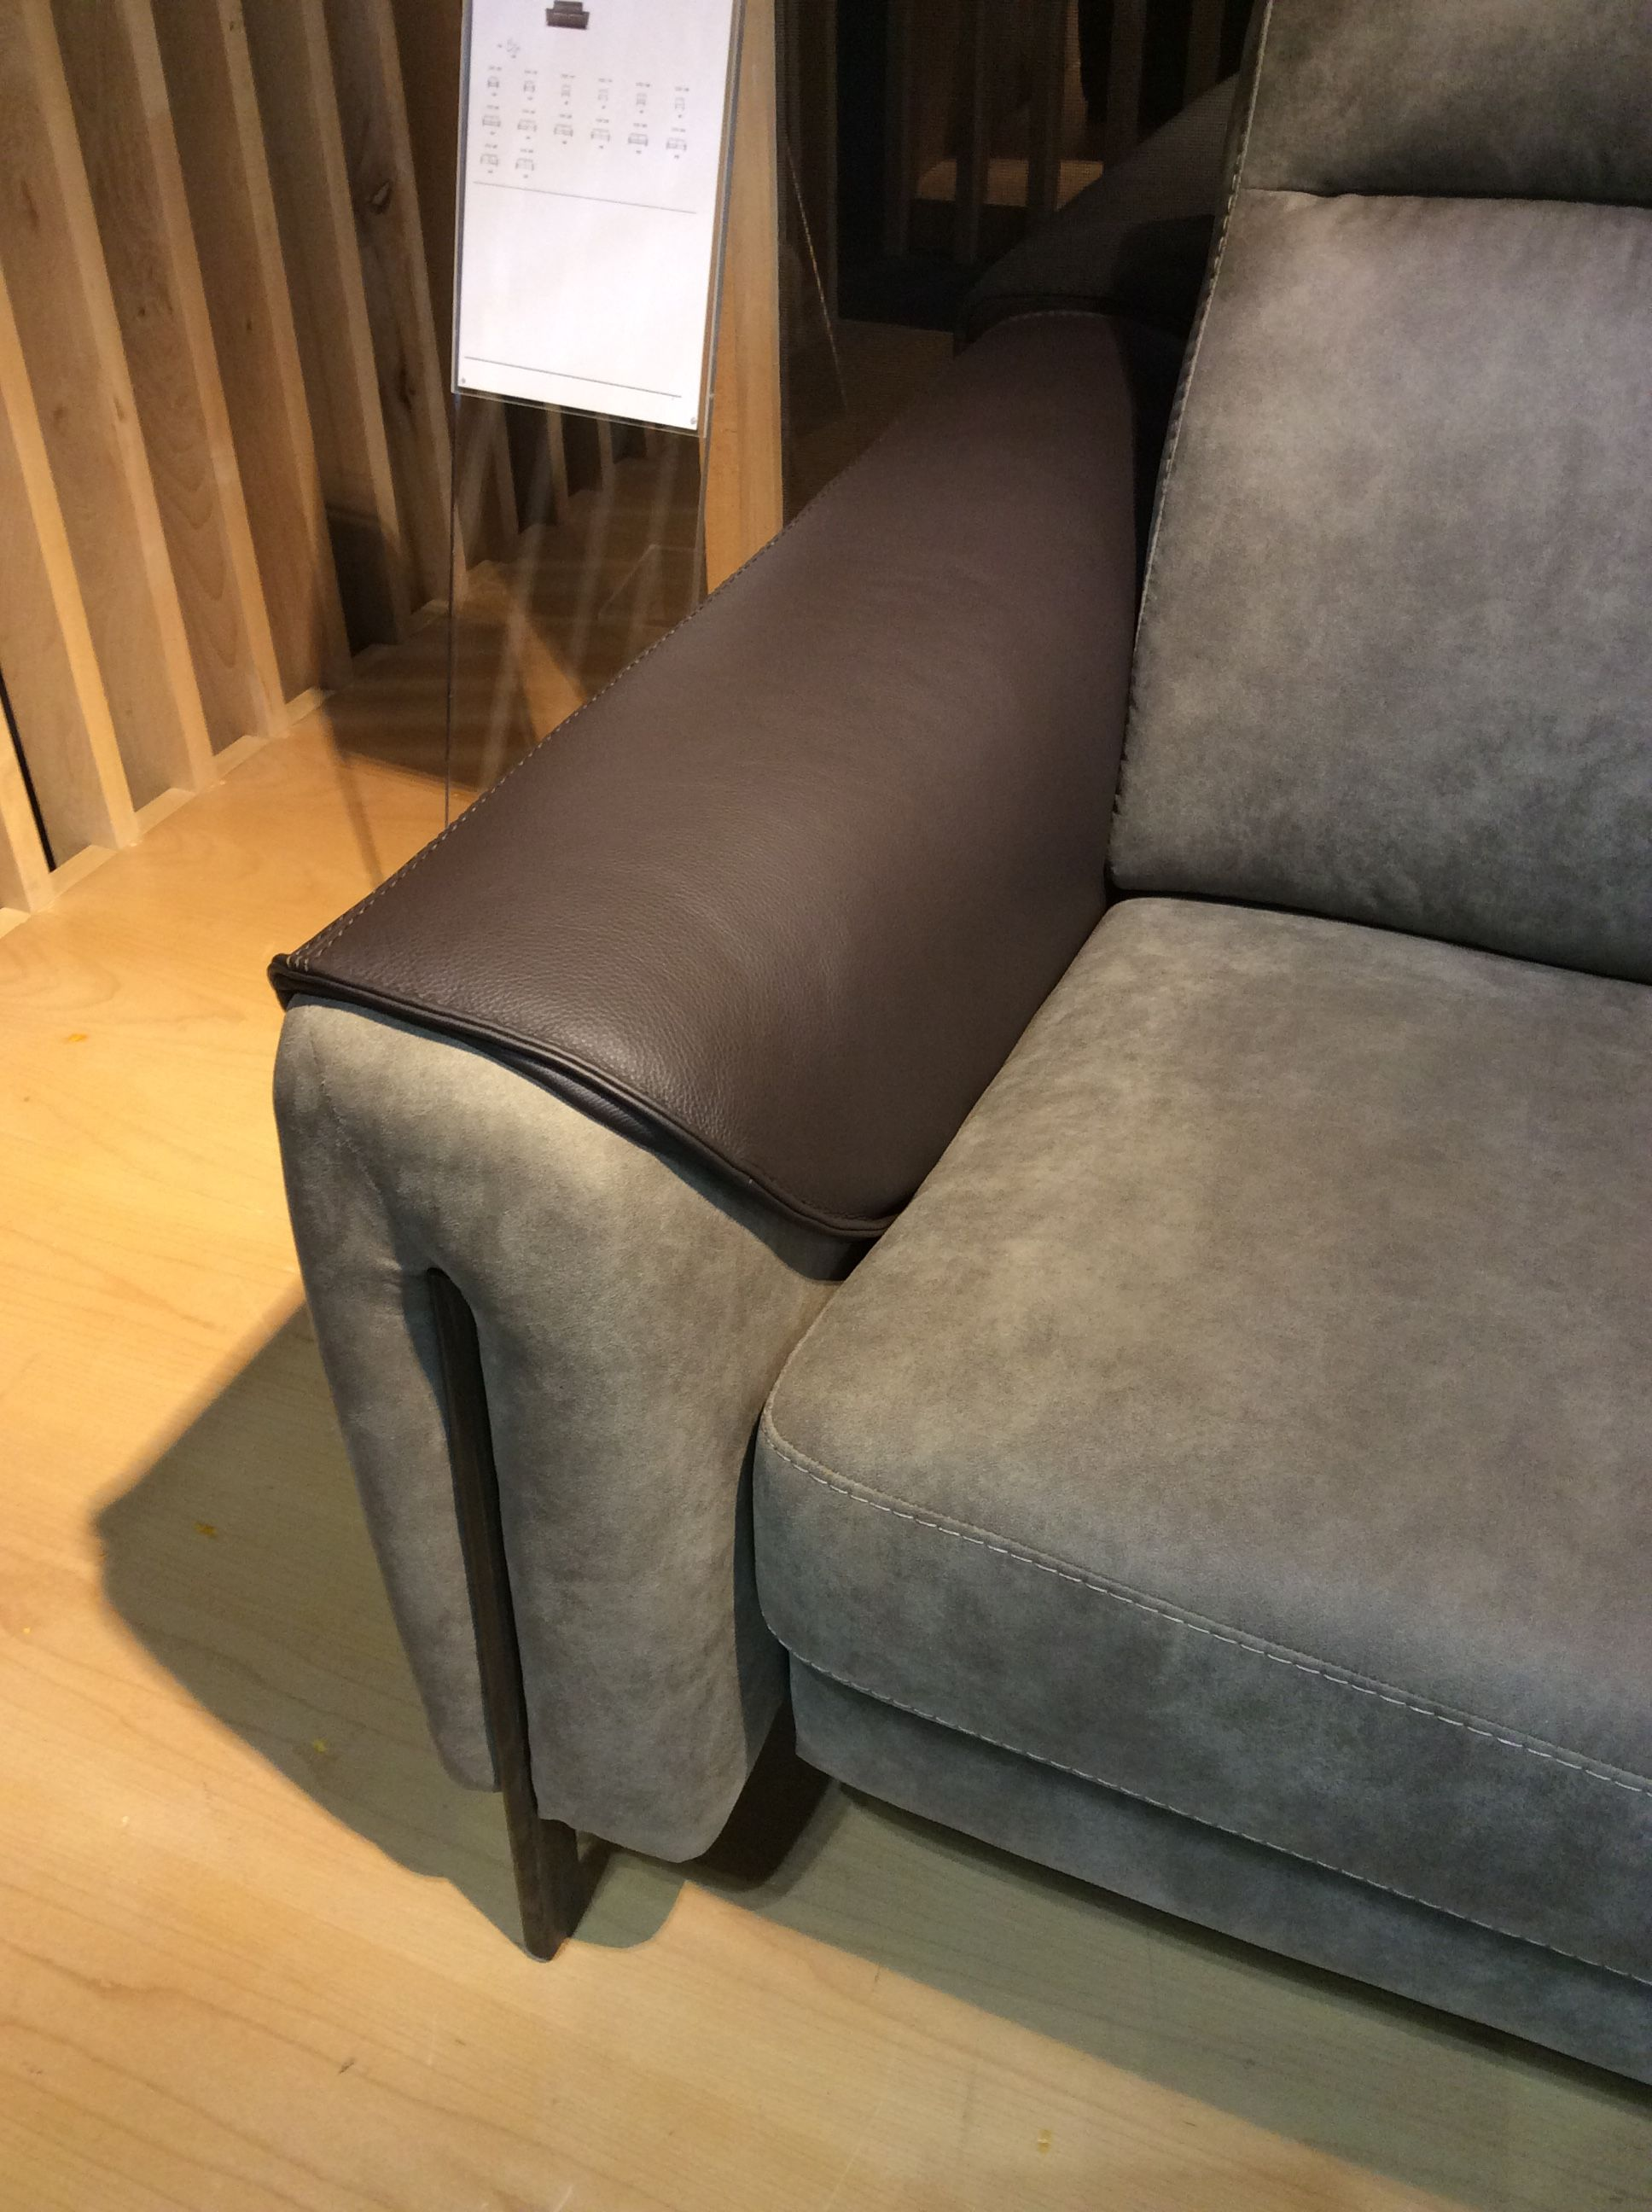 Pin by natalya surkova on Мебель pinterest upholstery sofa